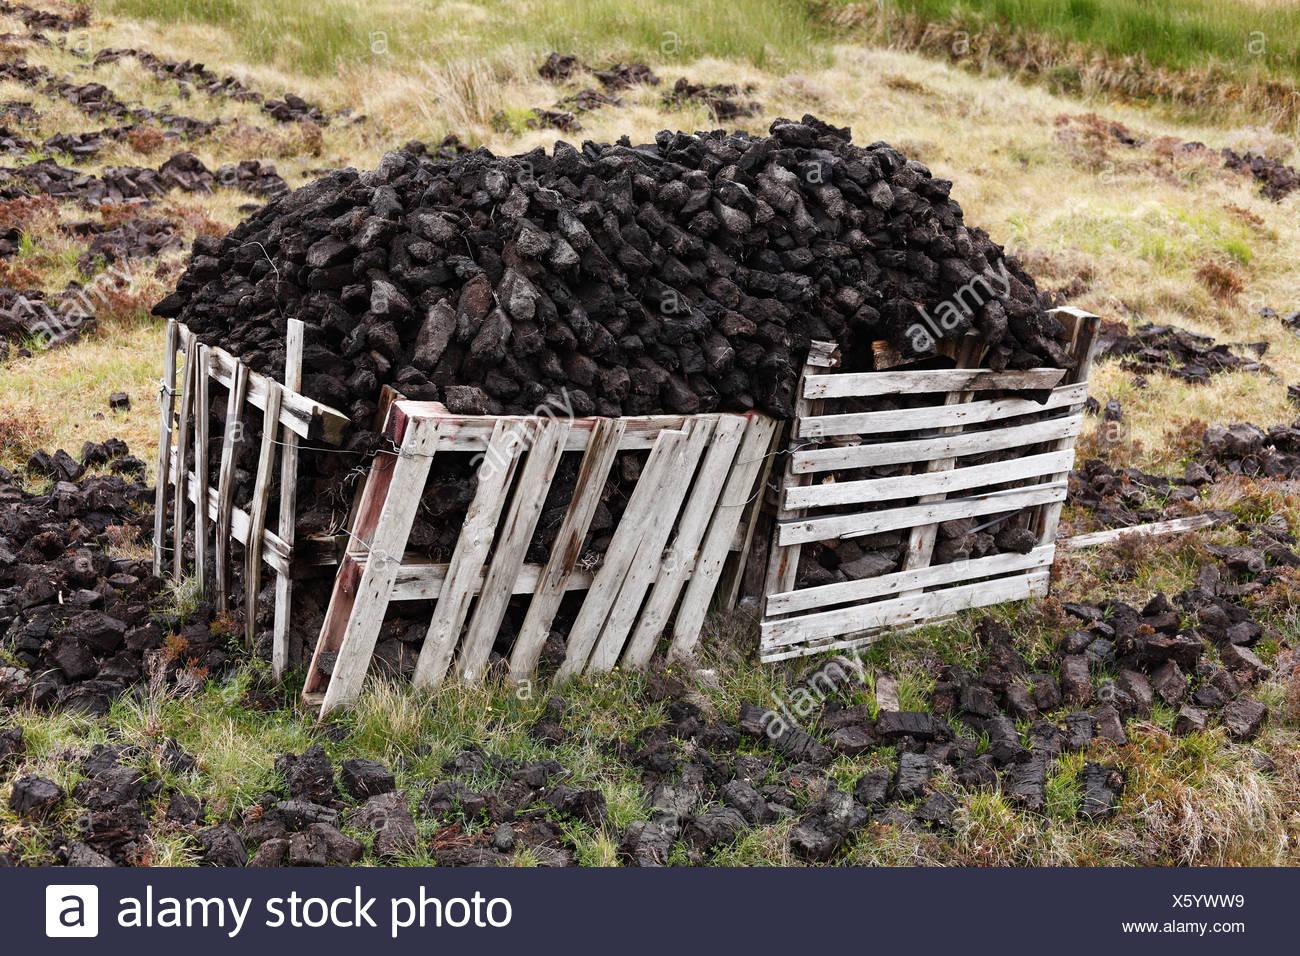 Peat cutting, Glencolumbcille, or Glencolumbkille, County Donegal, Ireland, Europe, PublicGround - Stock Image